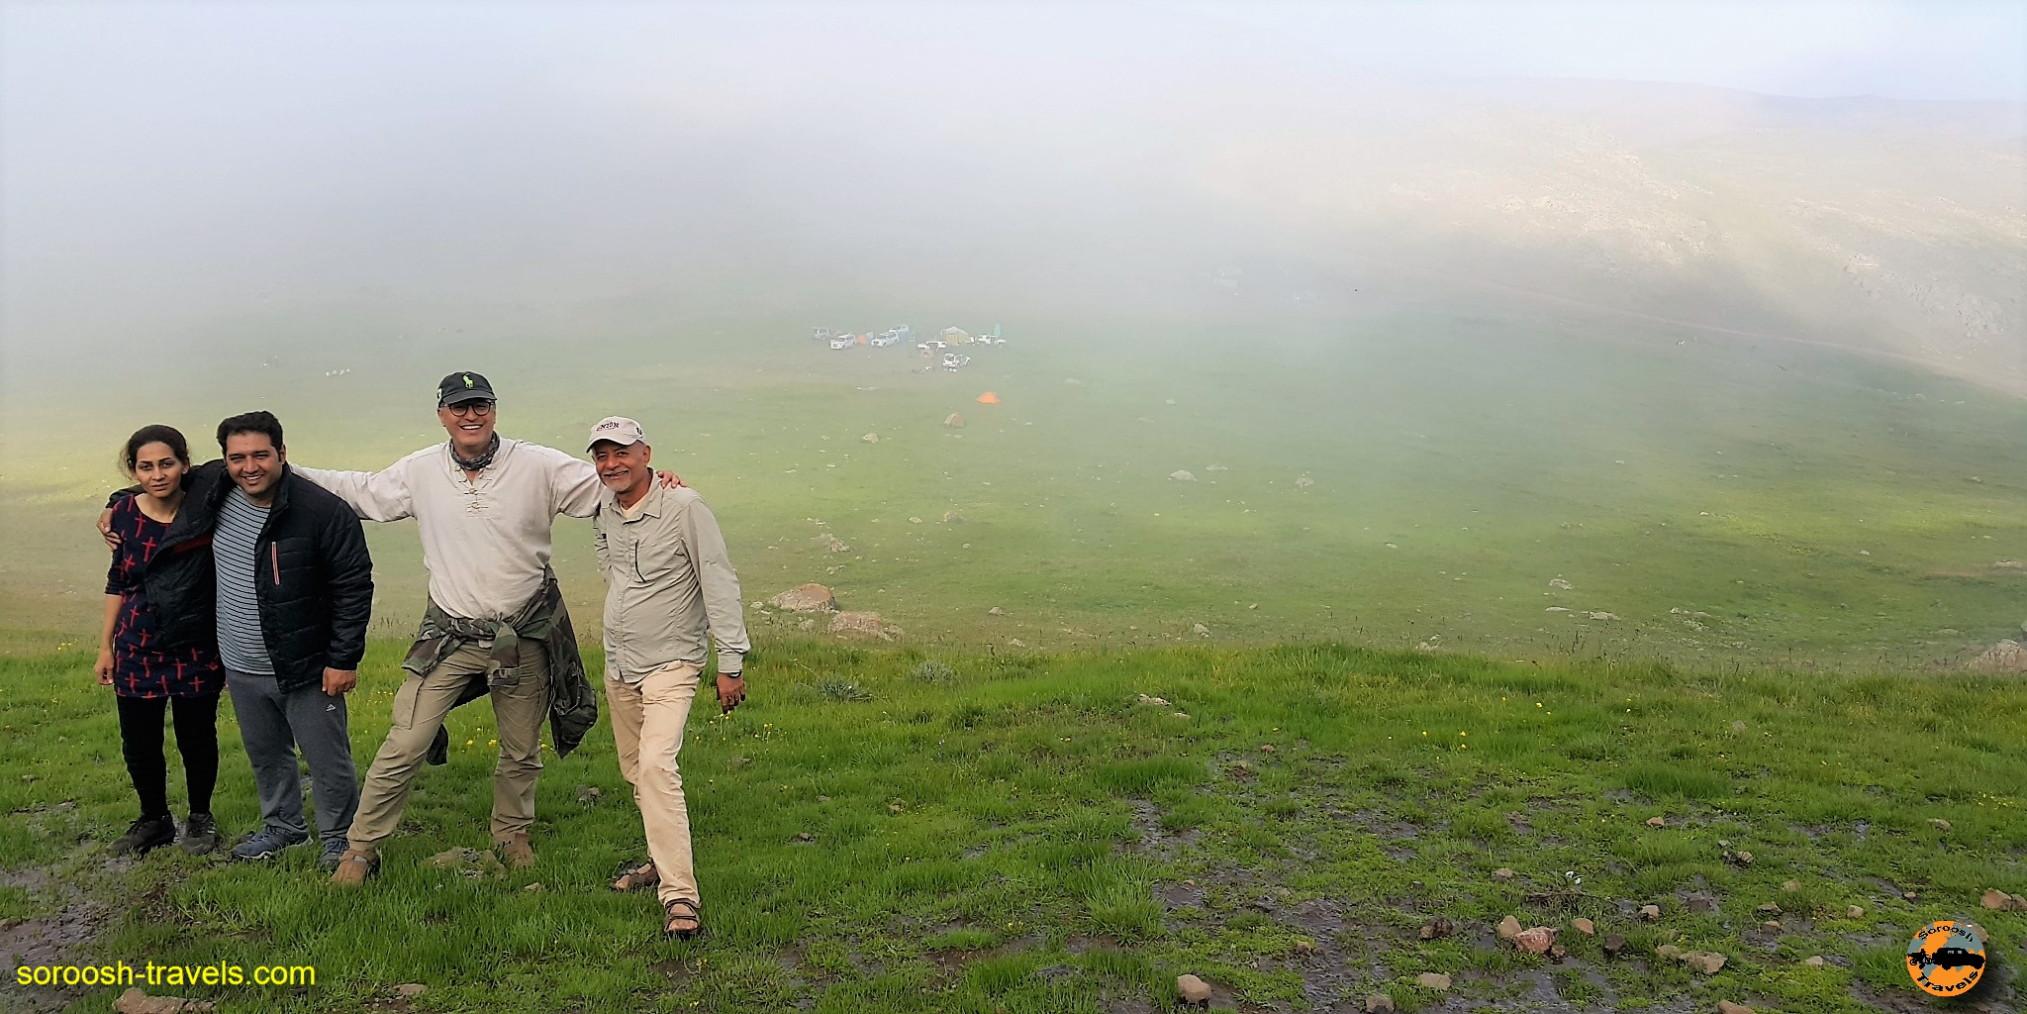 مناظر اطراف دریاچه نئور - تابستان ۱۳۹۶